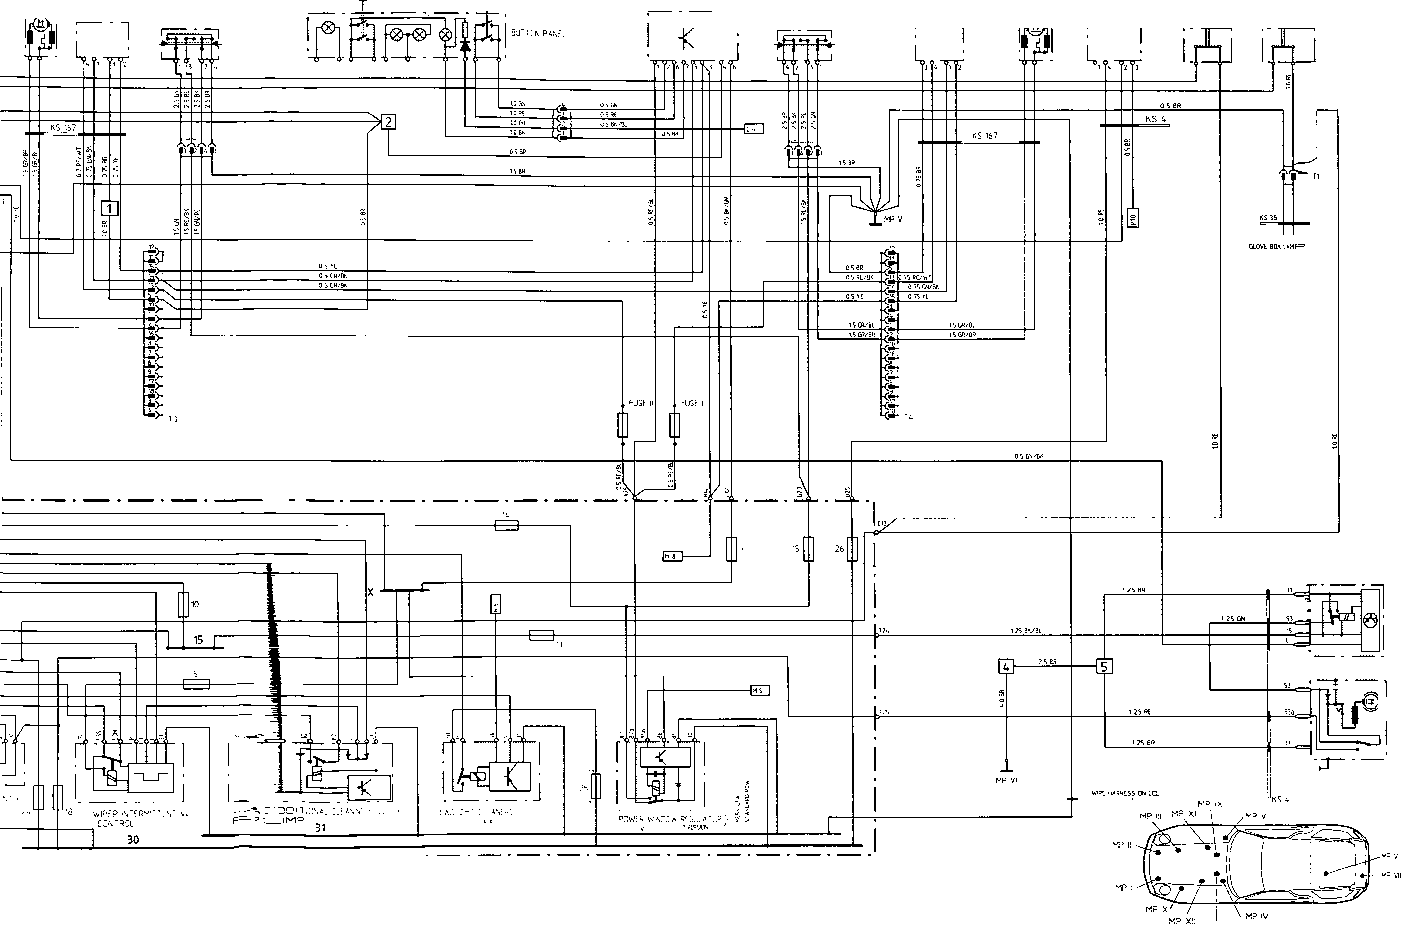 Wiring Diagram Nissan Elgrand : Nissan diagrams elgrand e wiring diagram